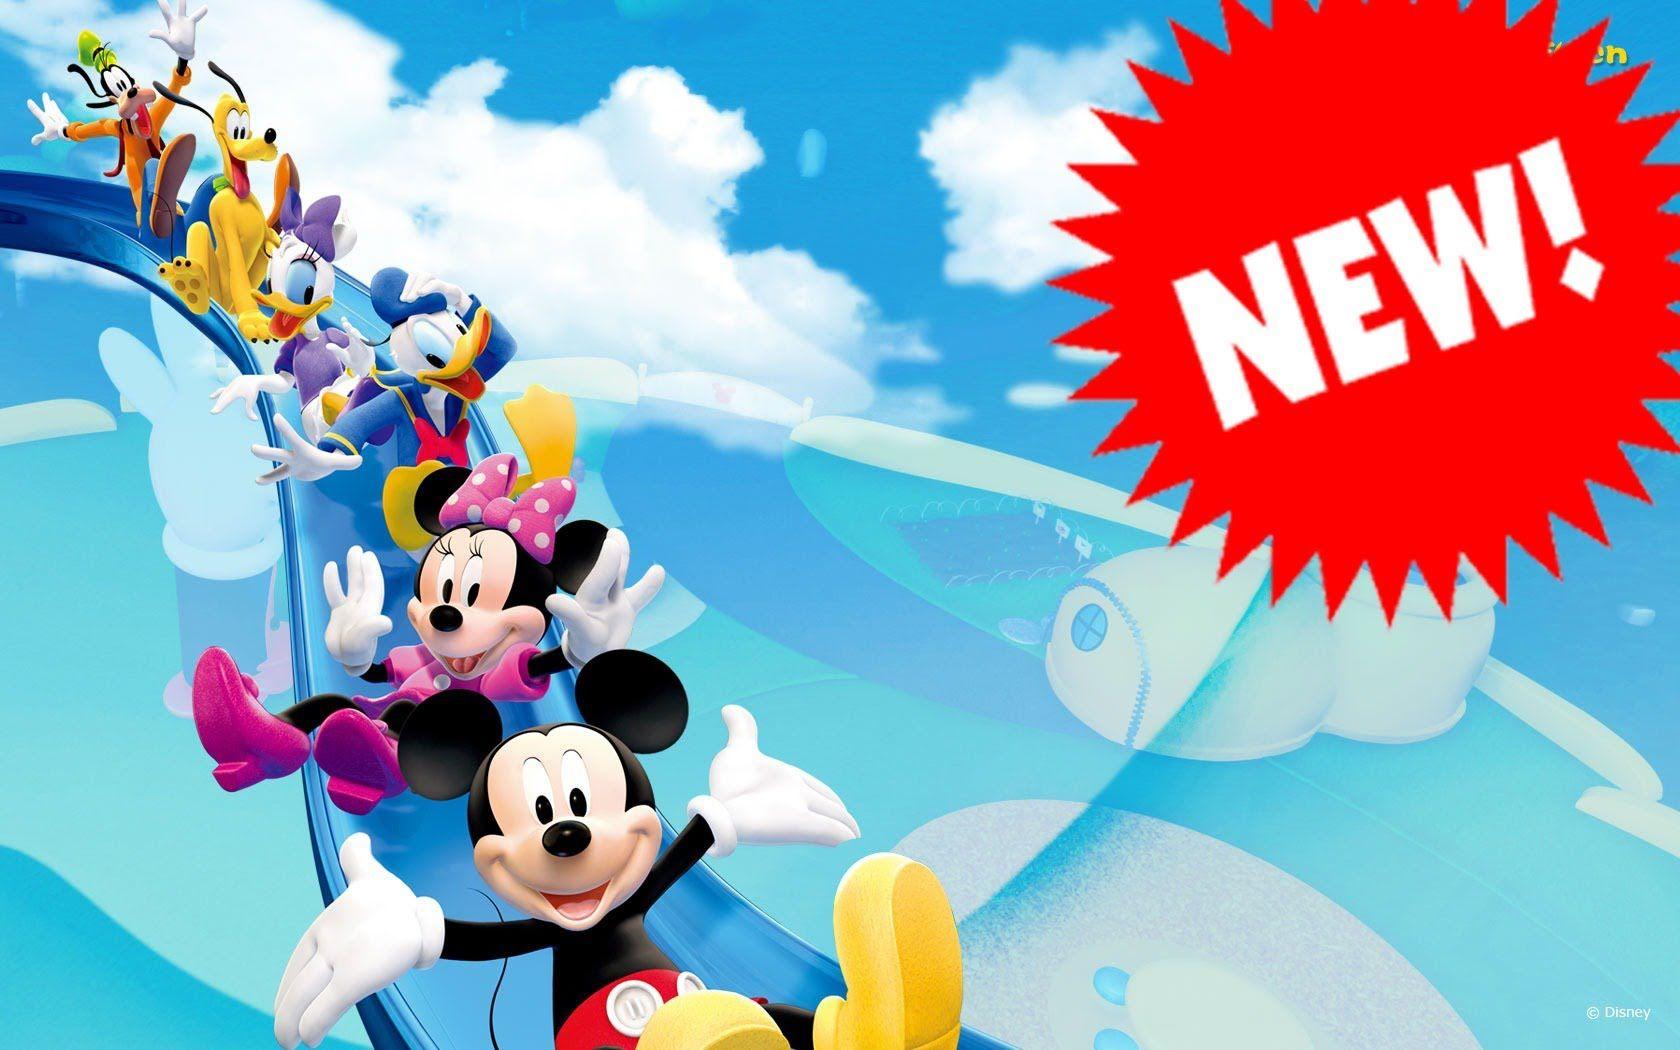 La casa de mickey mouse en espa ol latino capitulos completos nuevos epi pinterest casa - Youtube casa mickey mouse ...